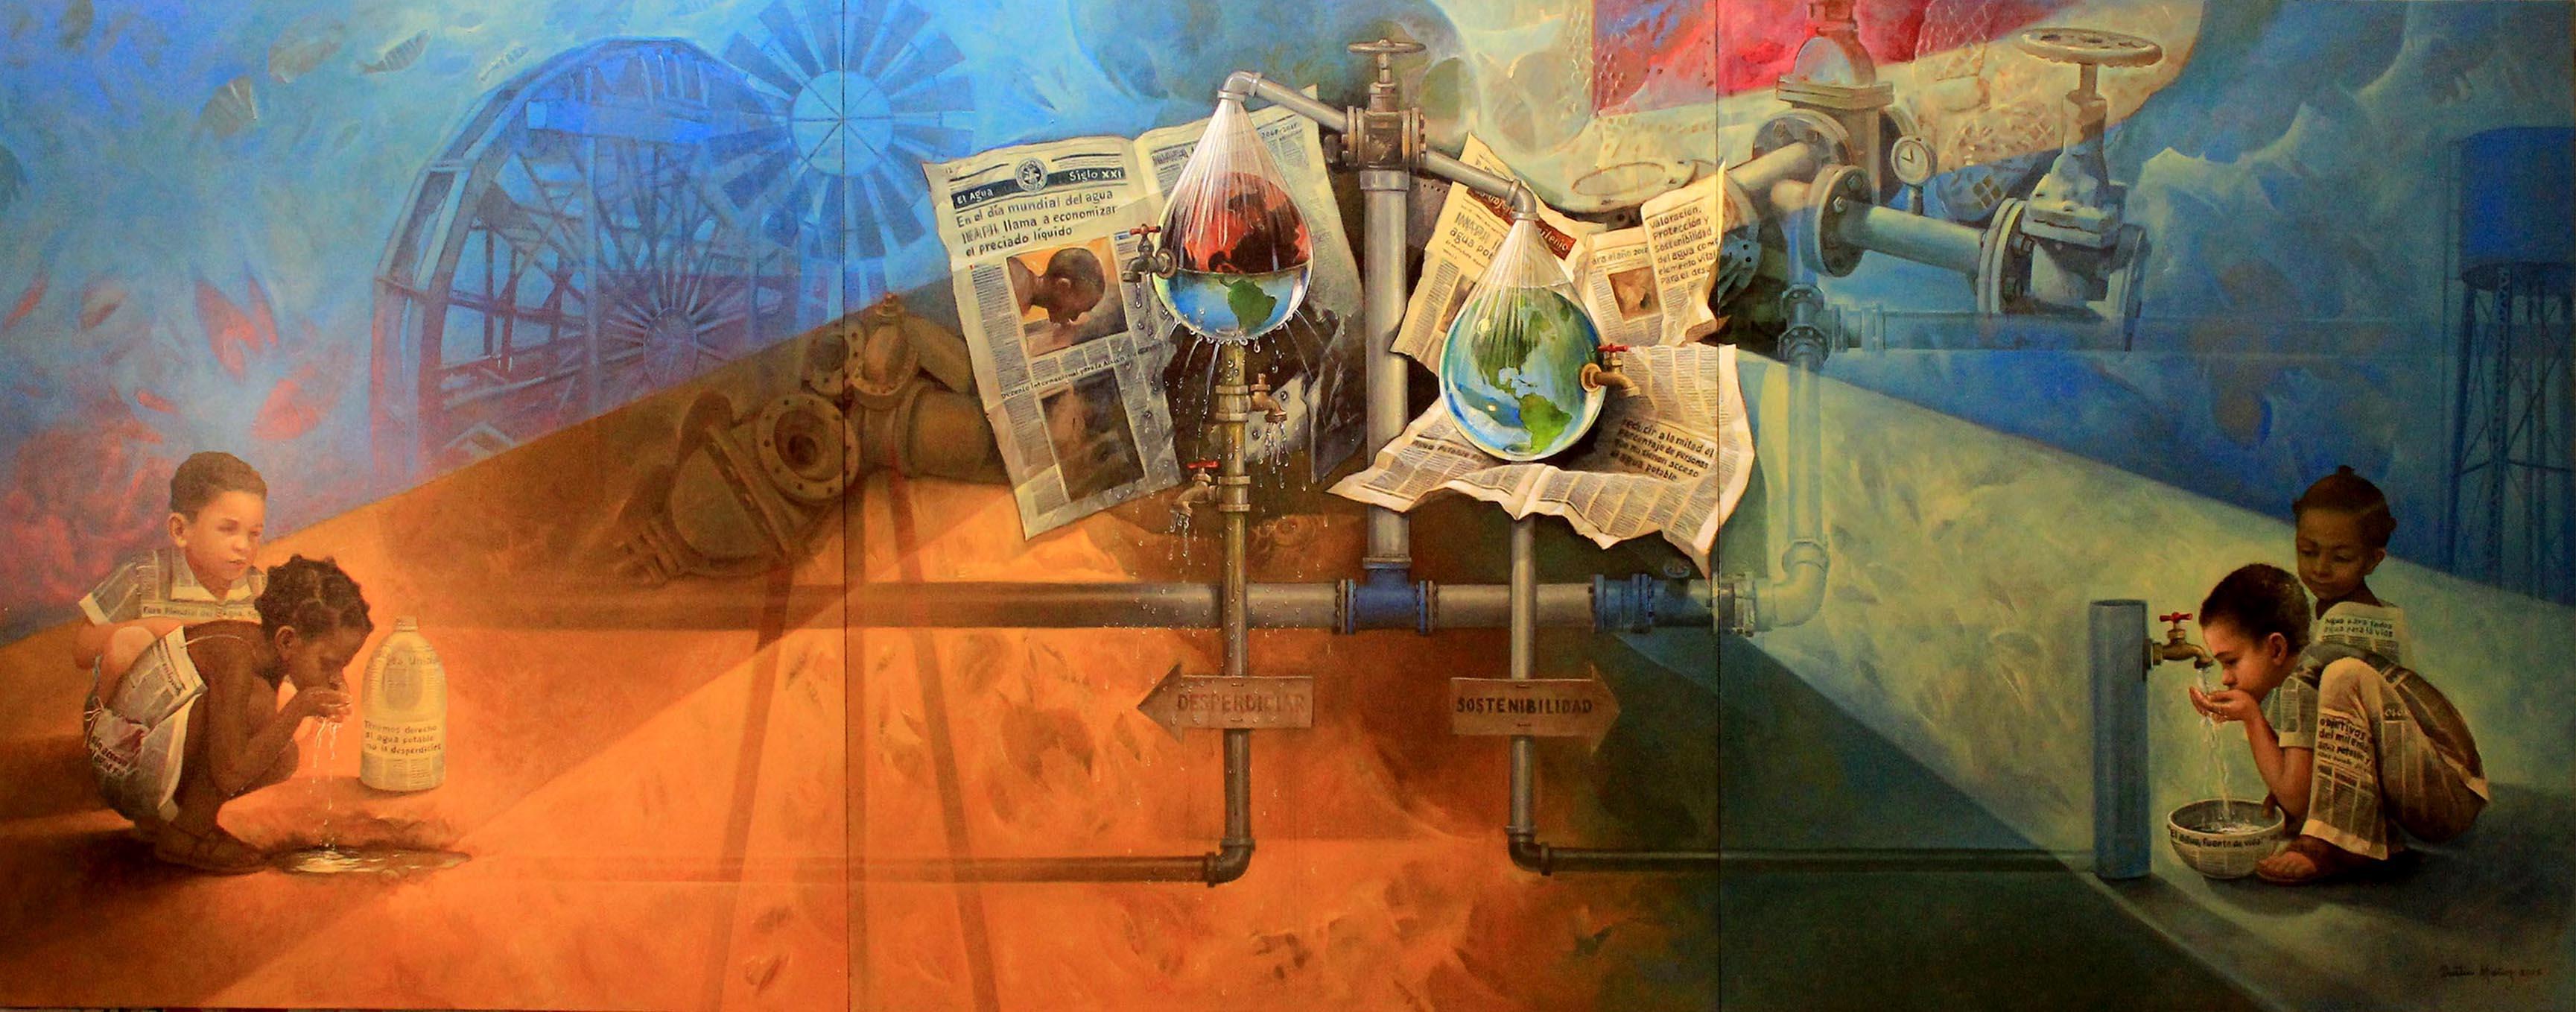 El agua en el siglo XXI, 70″ x 180″ pulgs, Dustin Muñoz, 2015